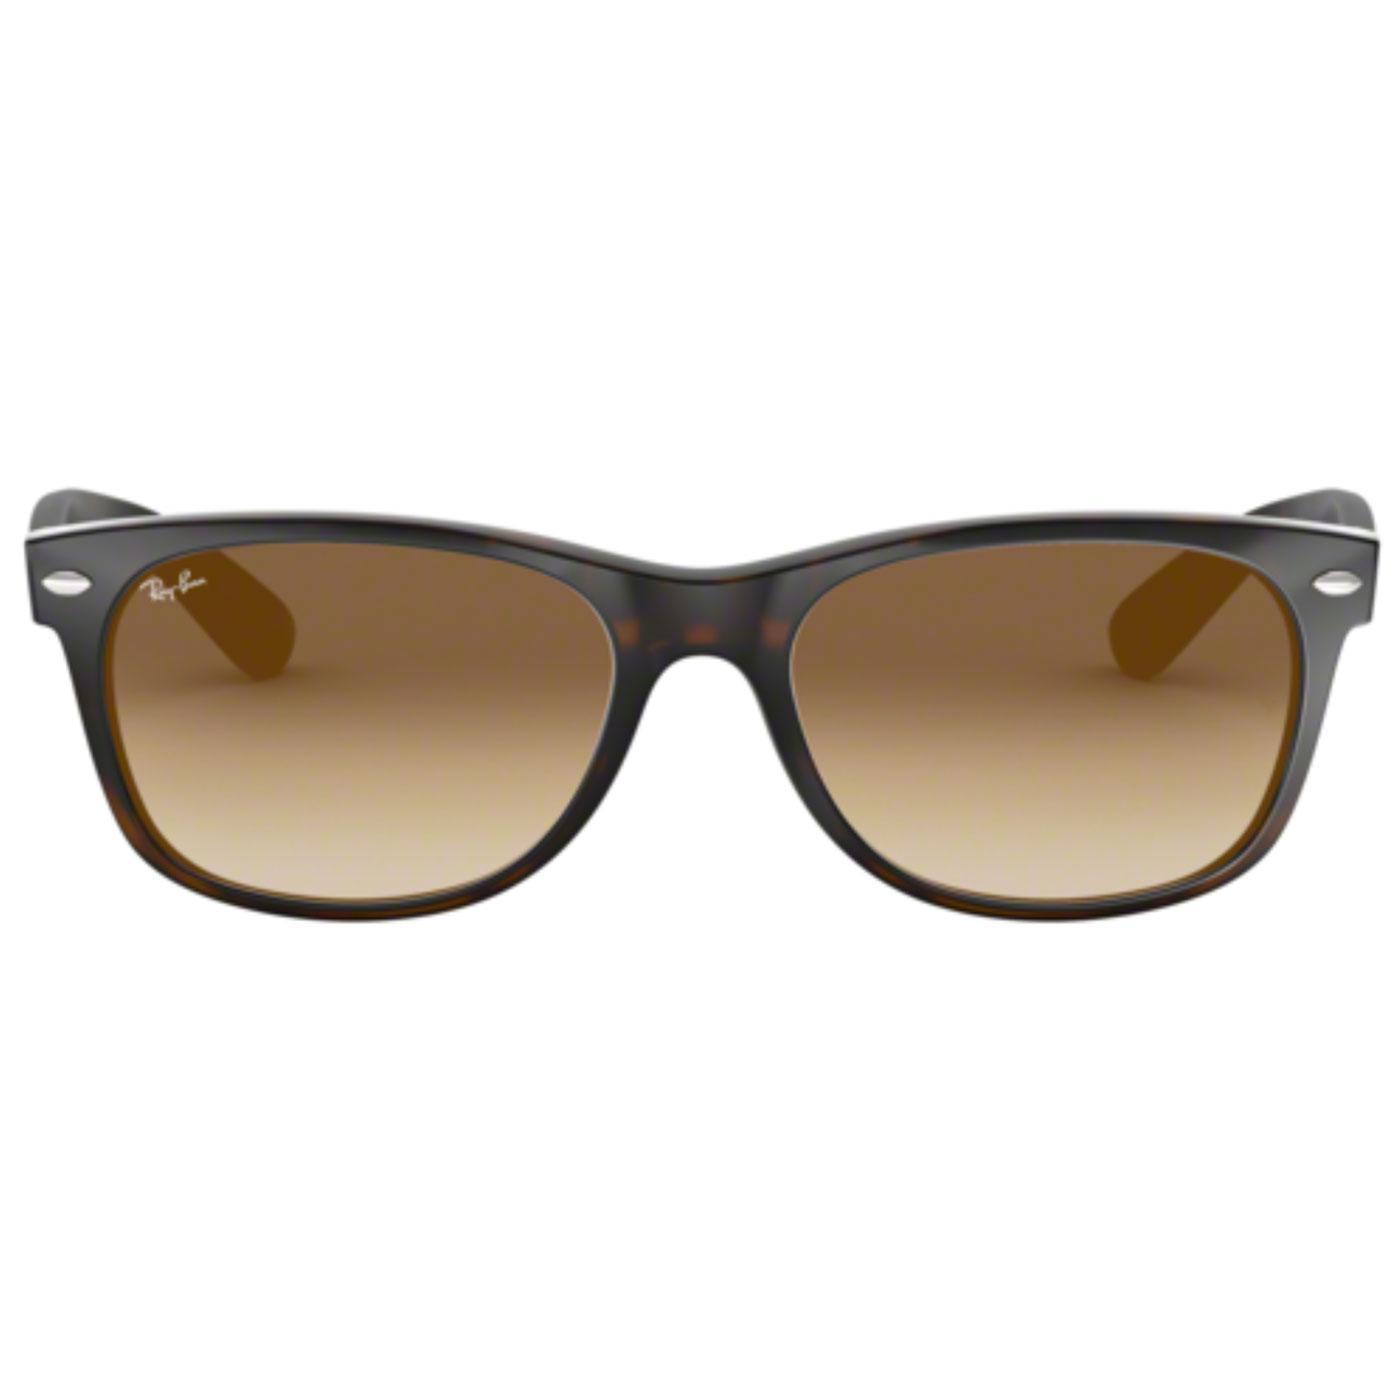 New Wayfarer RAY-BAN Retro 60s Sunglasses - Havana